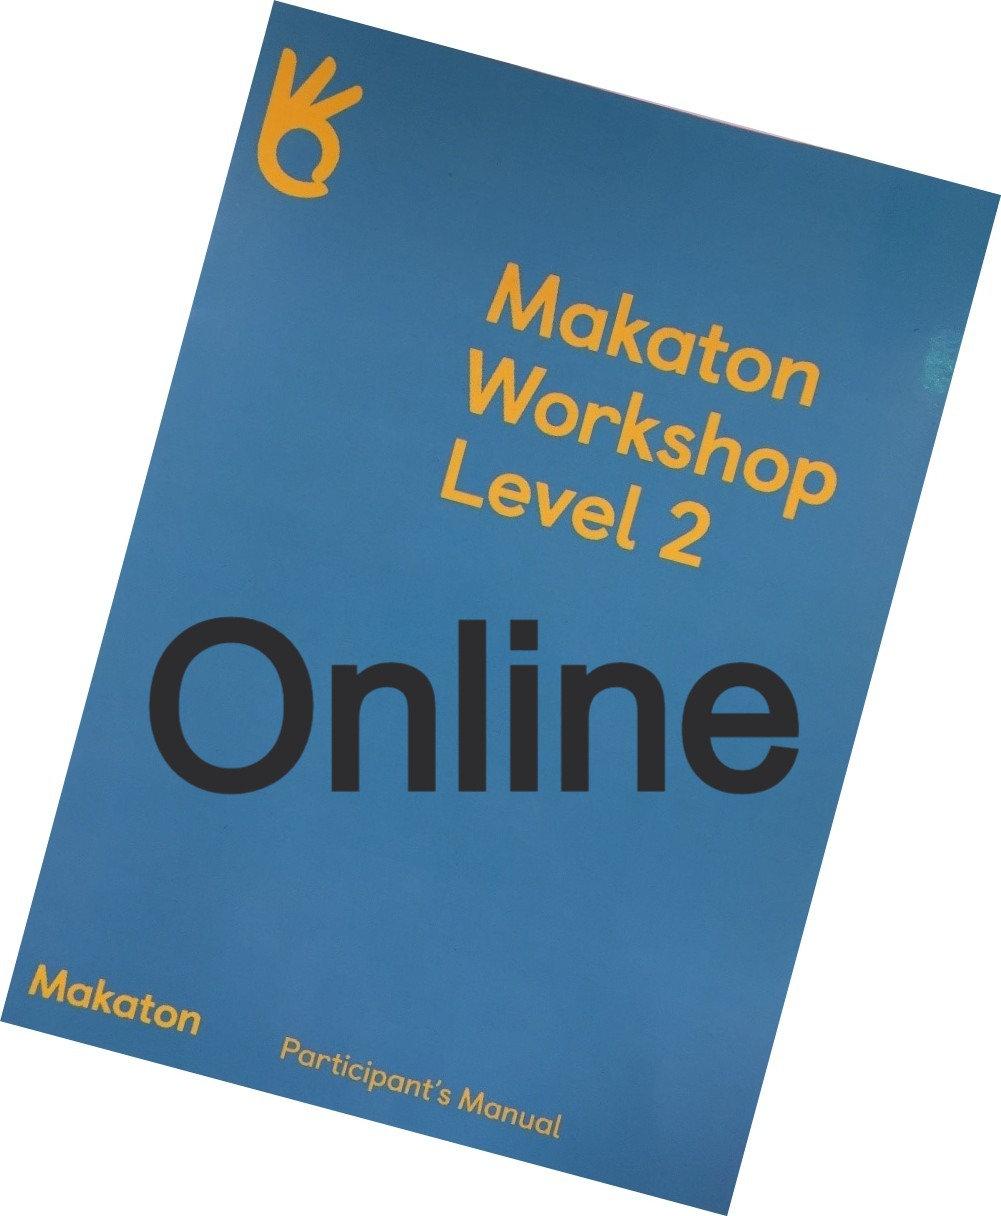 ONLINE Makaton Workshop Level 2